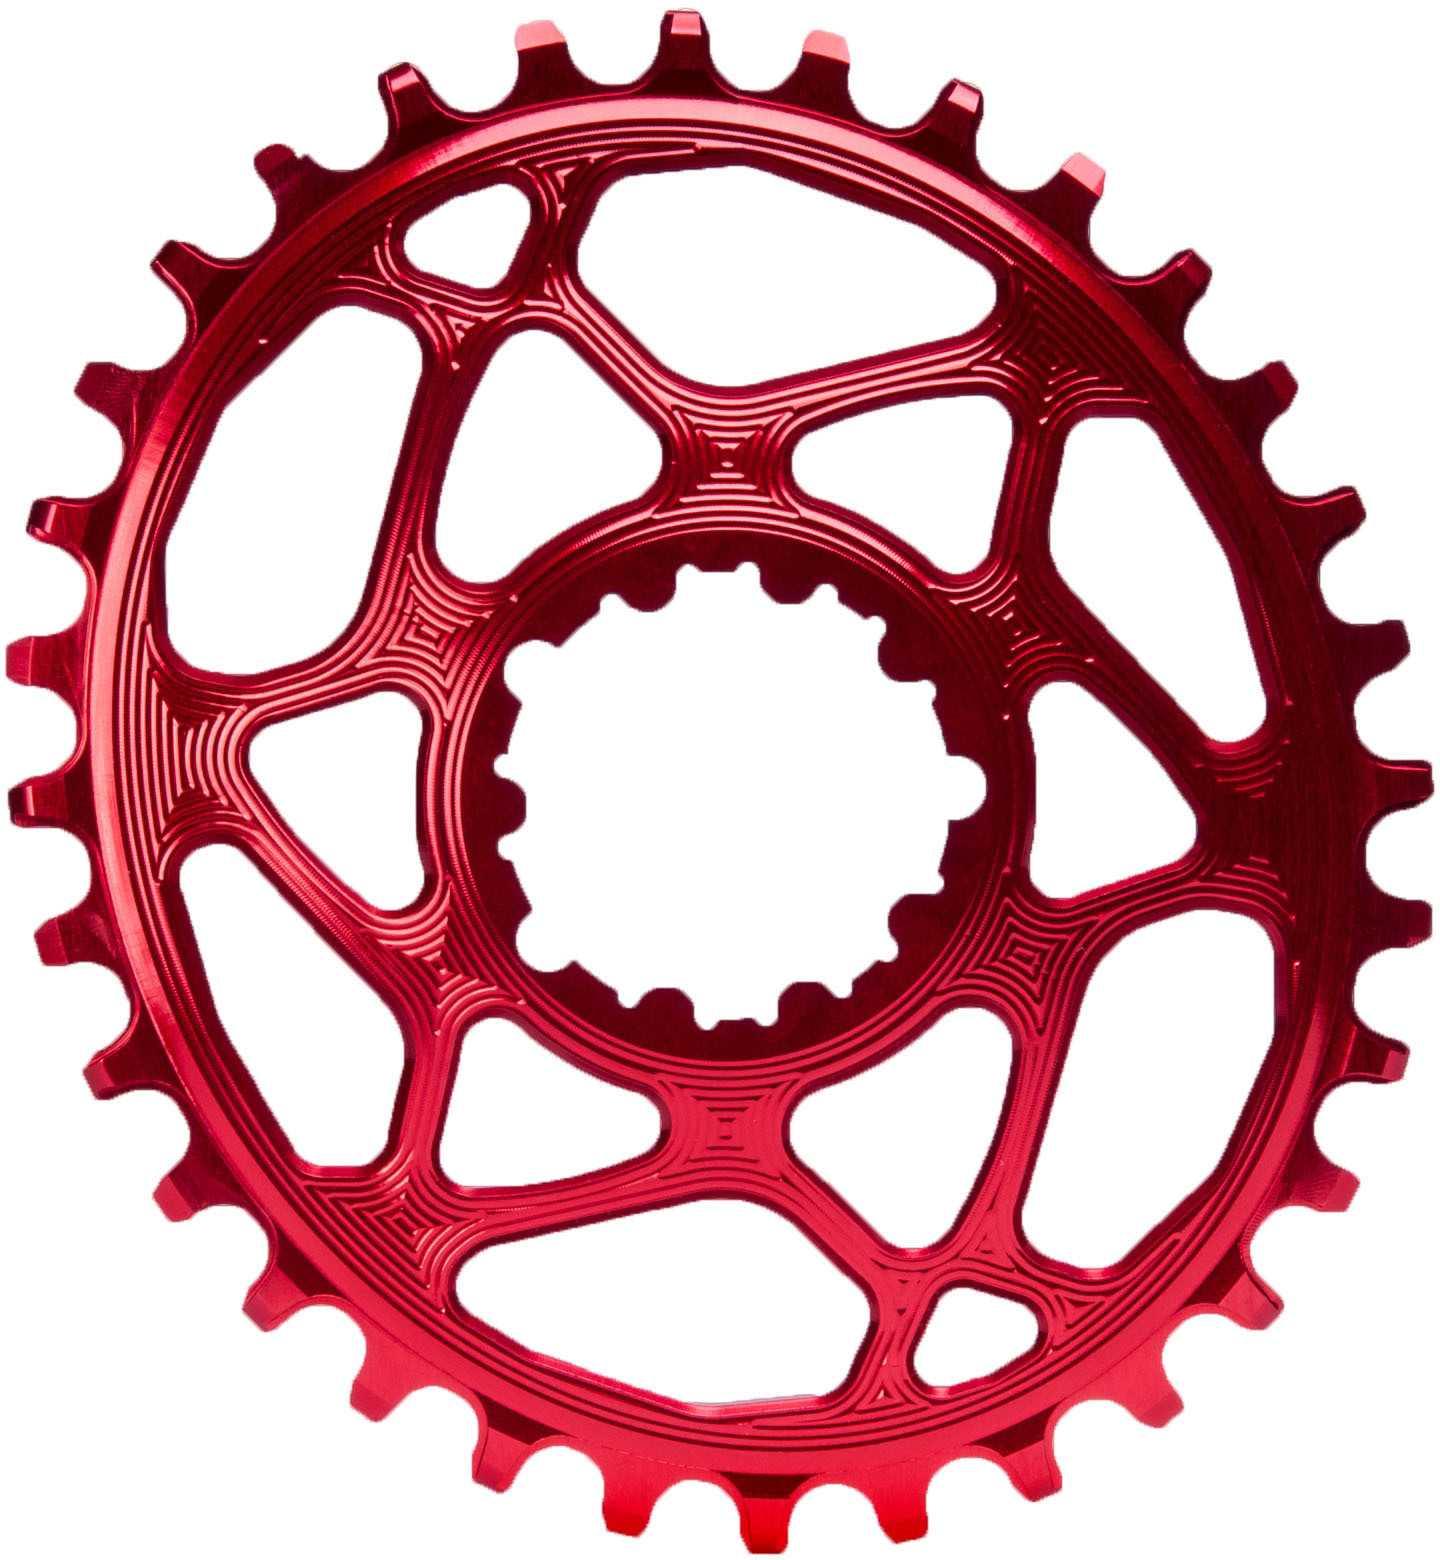 FRONT KLINGE ABSOLUTEBLACK OVAL NARROW-WIDE RACE FACE CINCH 28T RØD | chainrings_component